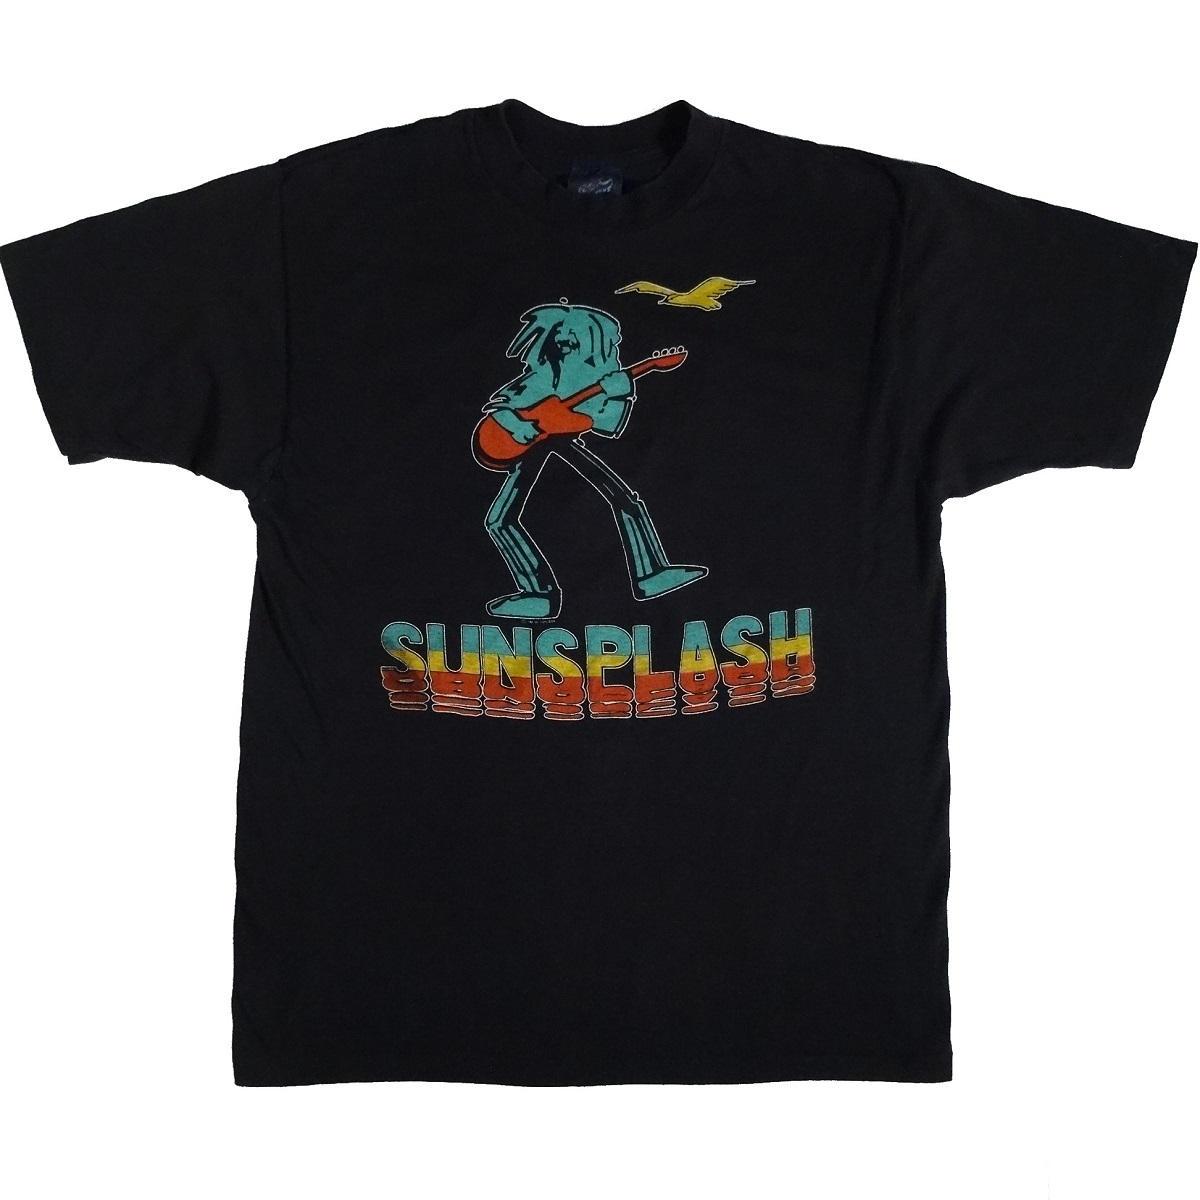 reggae sunsplash festival 1987 10th anniversary vintage t shirt front of shirt